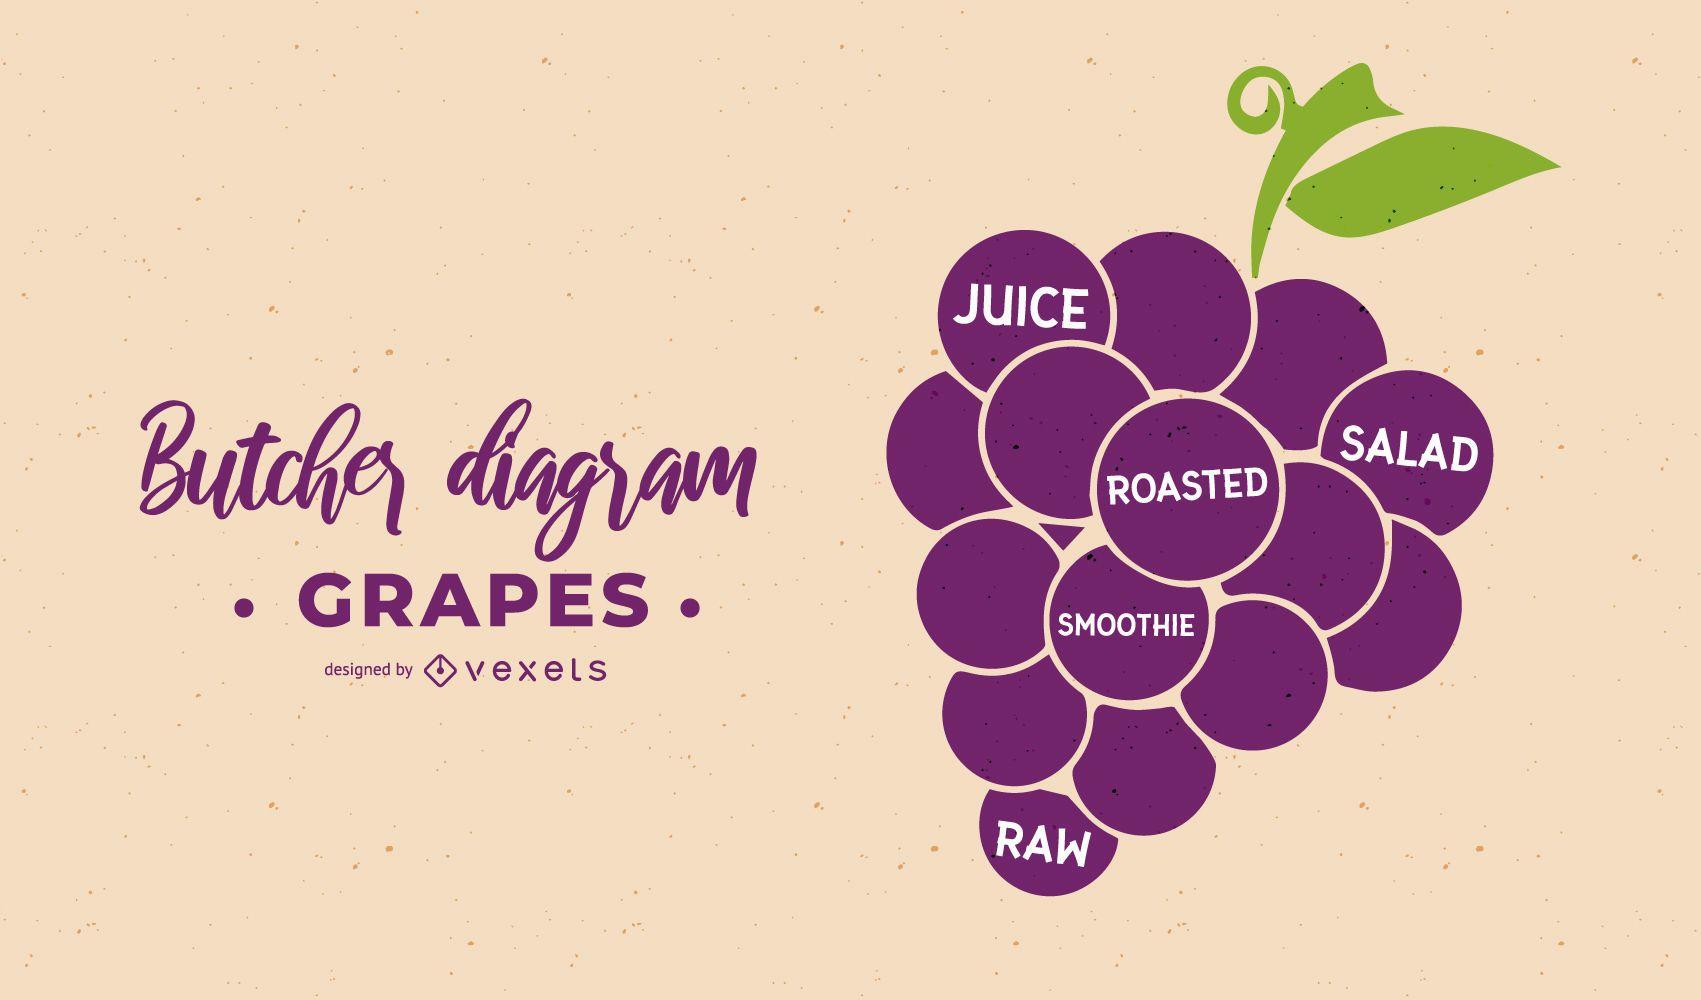 Grapes Butcher Diagram Design